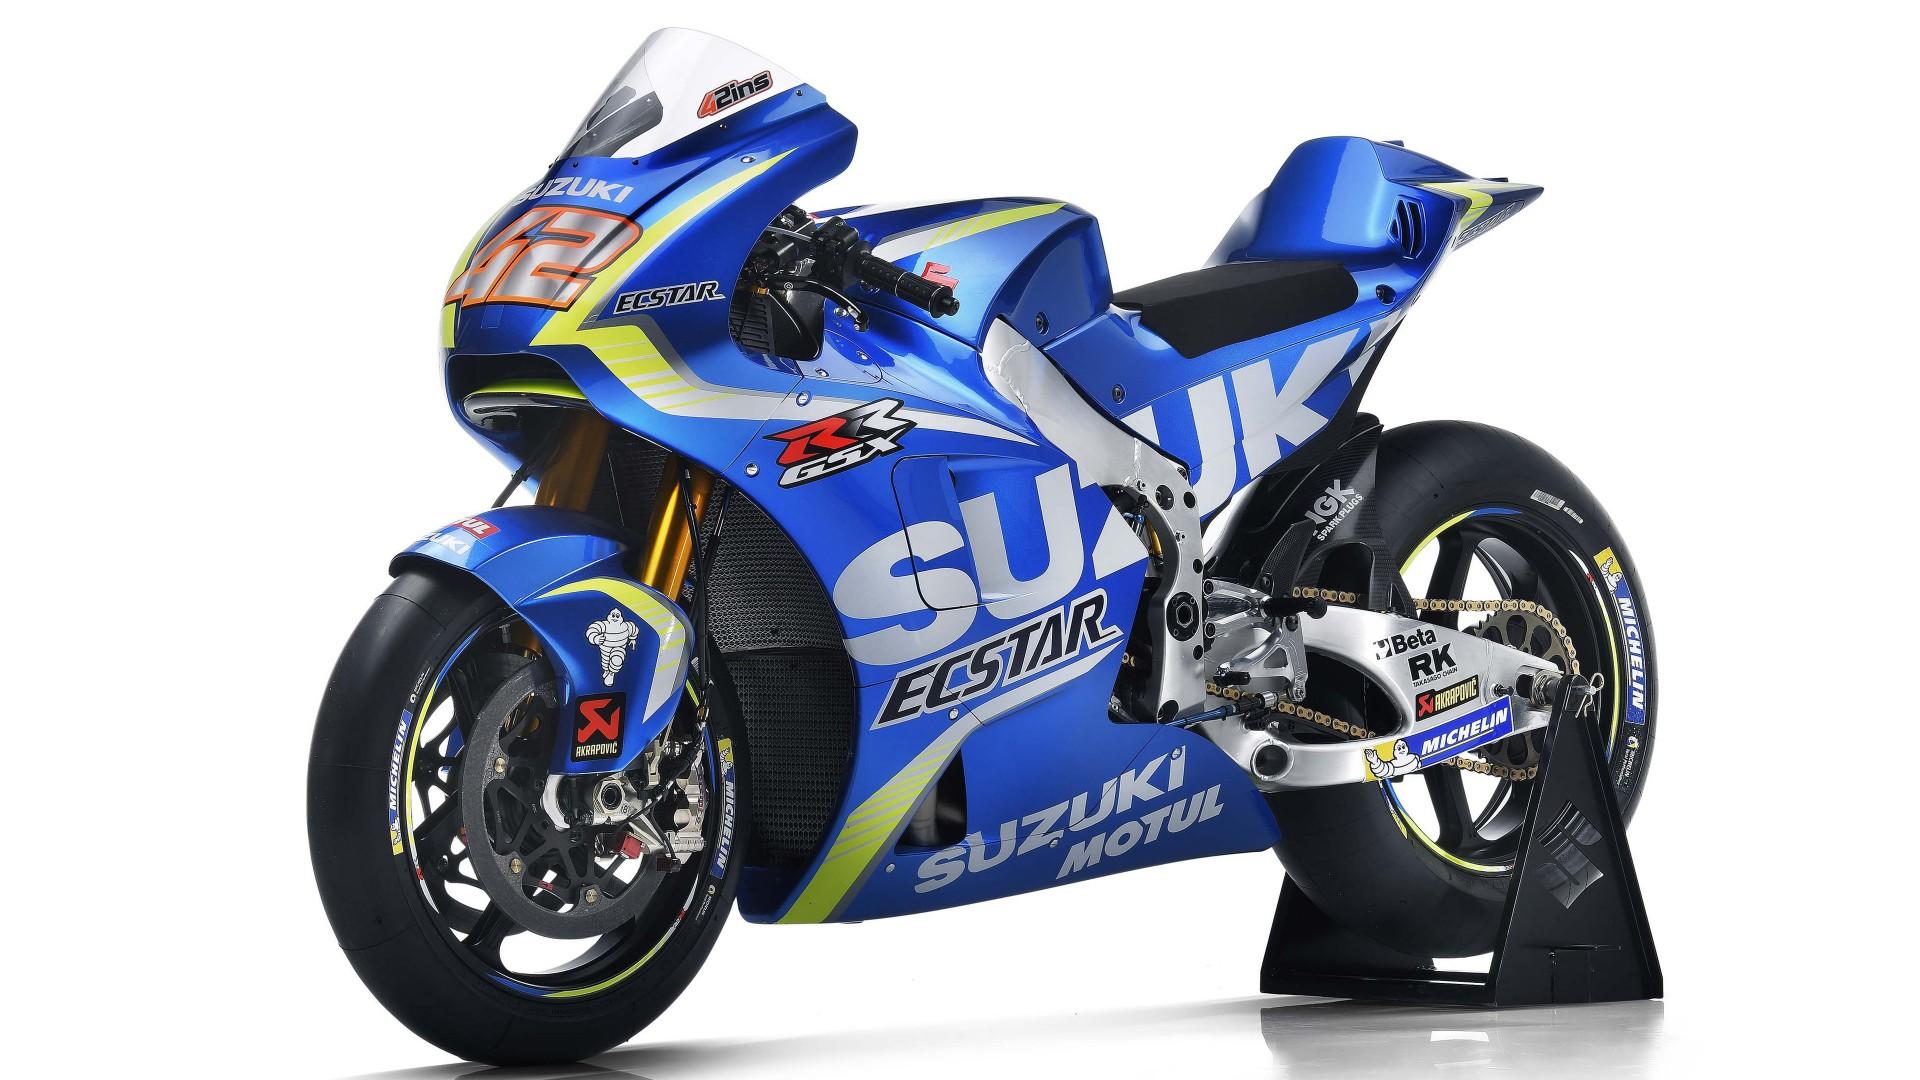 Ktm Duke Hd Wallpapers 2017 Ecstar Suzuki Team Motogp Bike Wallpapers Hd